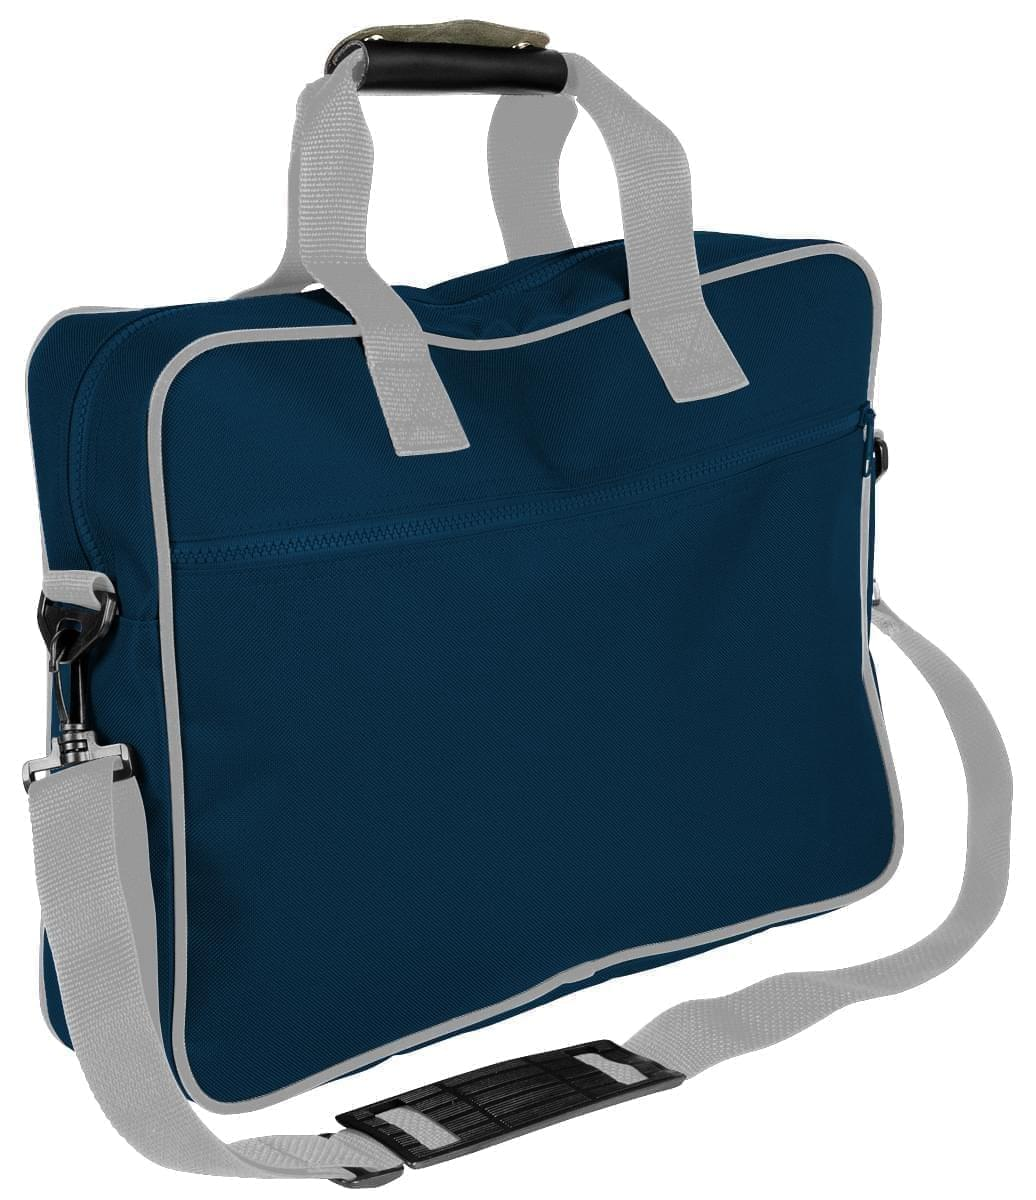 USA Made Nylon Poly Notebook Sleeves, Navy-Grey, CPKVA59PWU